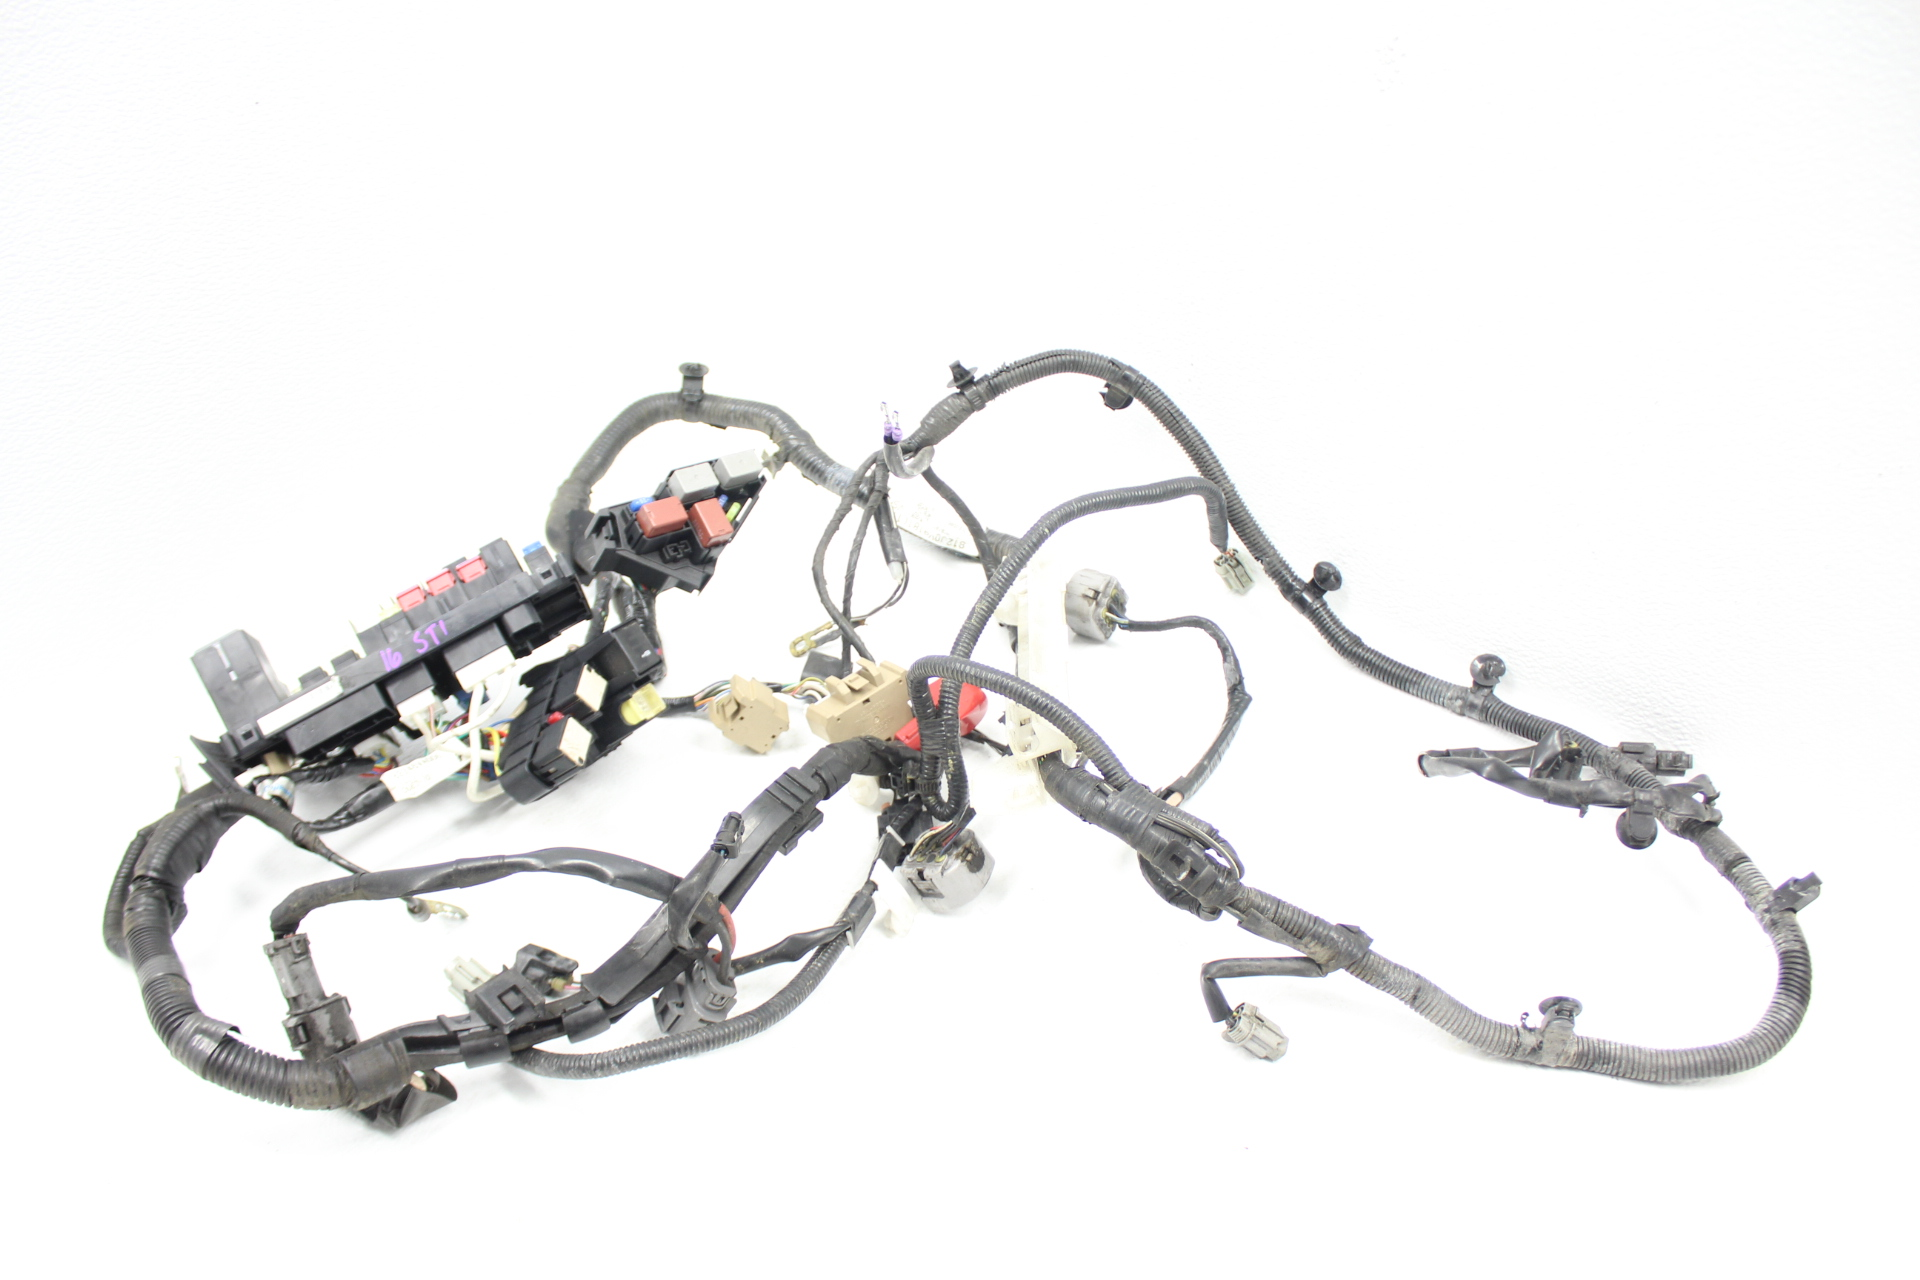 2015-2020 subaru wrx sti alternator wiring harness